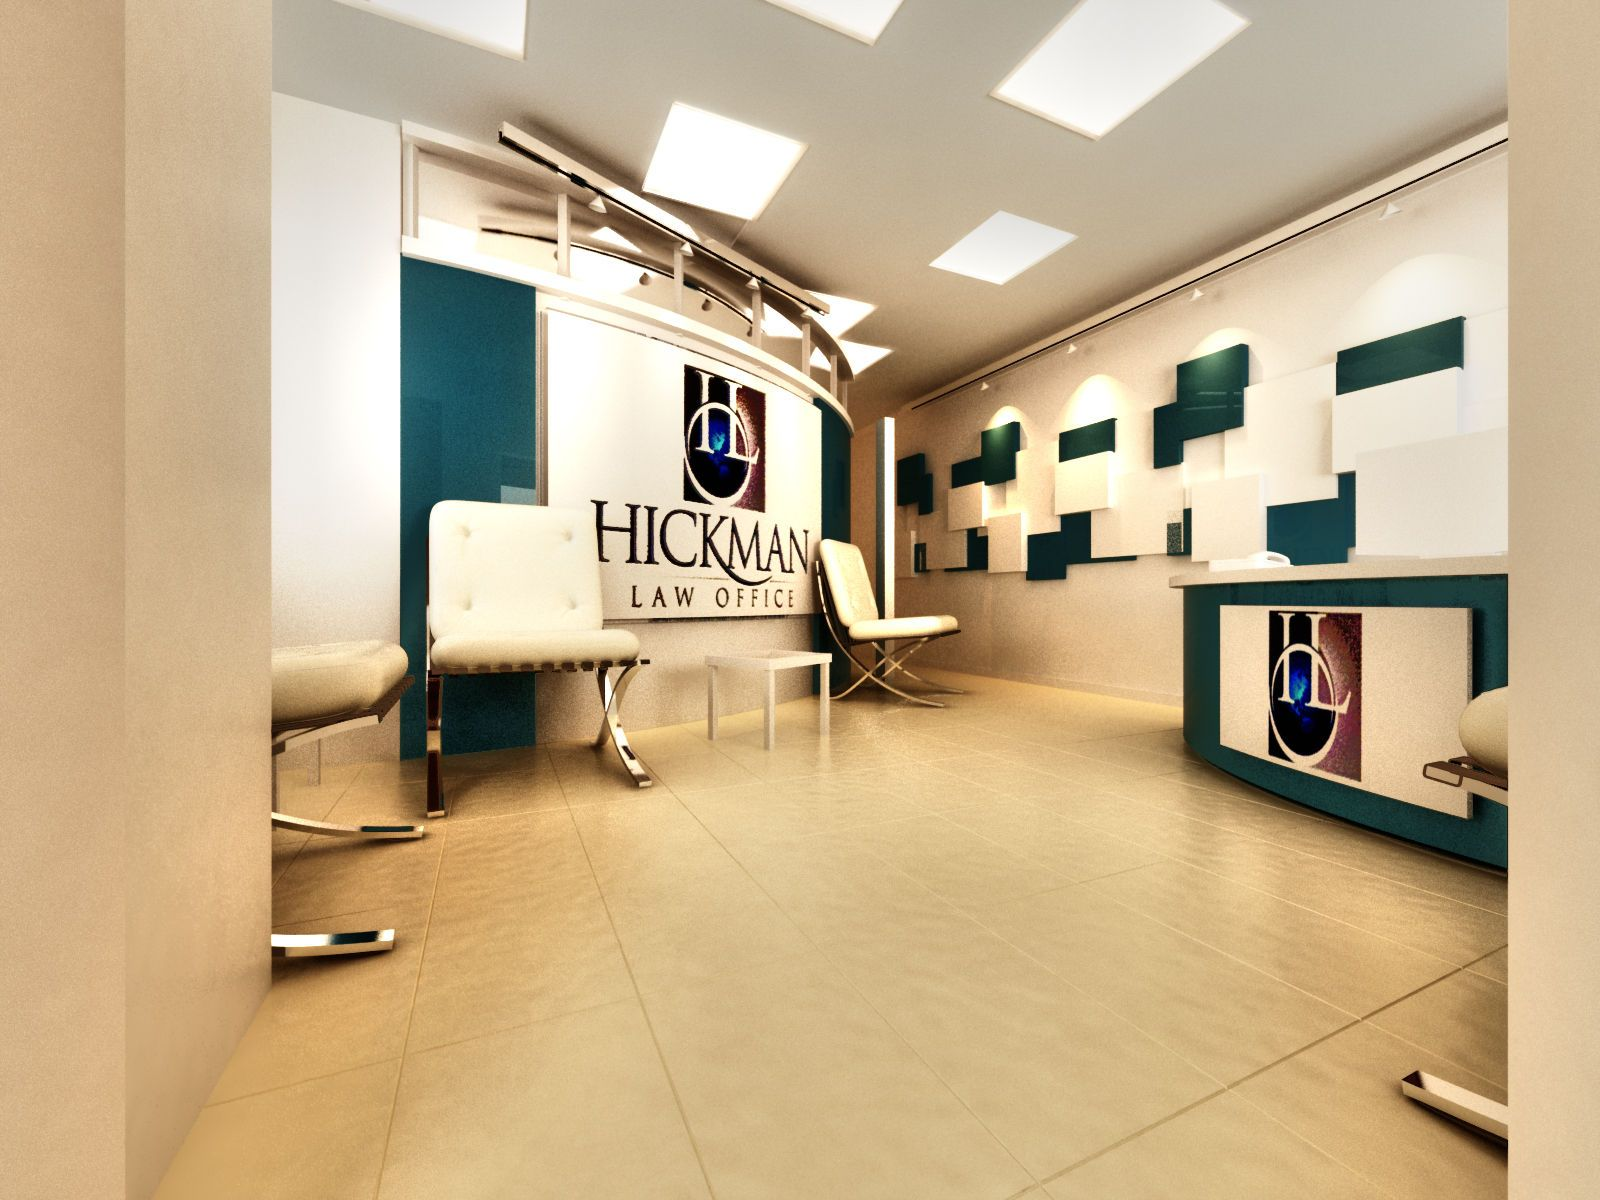 Design Professional Office Decorating Ideas   Office Room Design ...